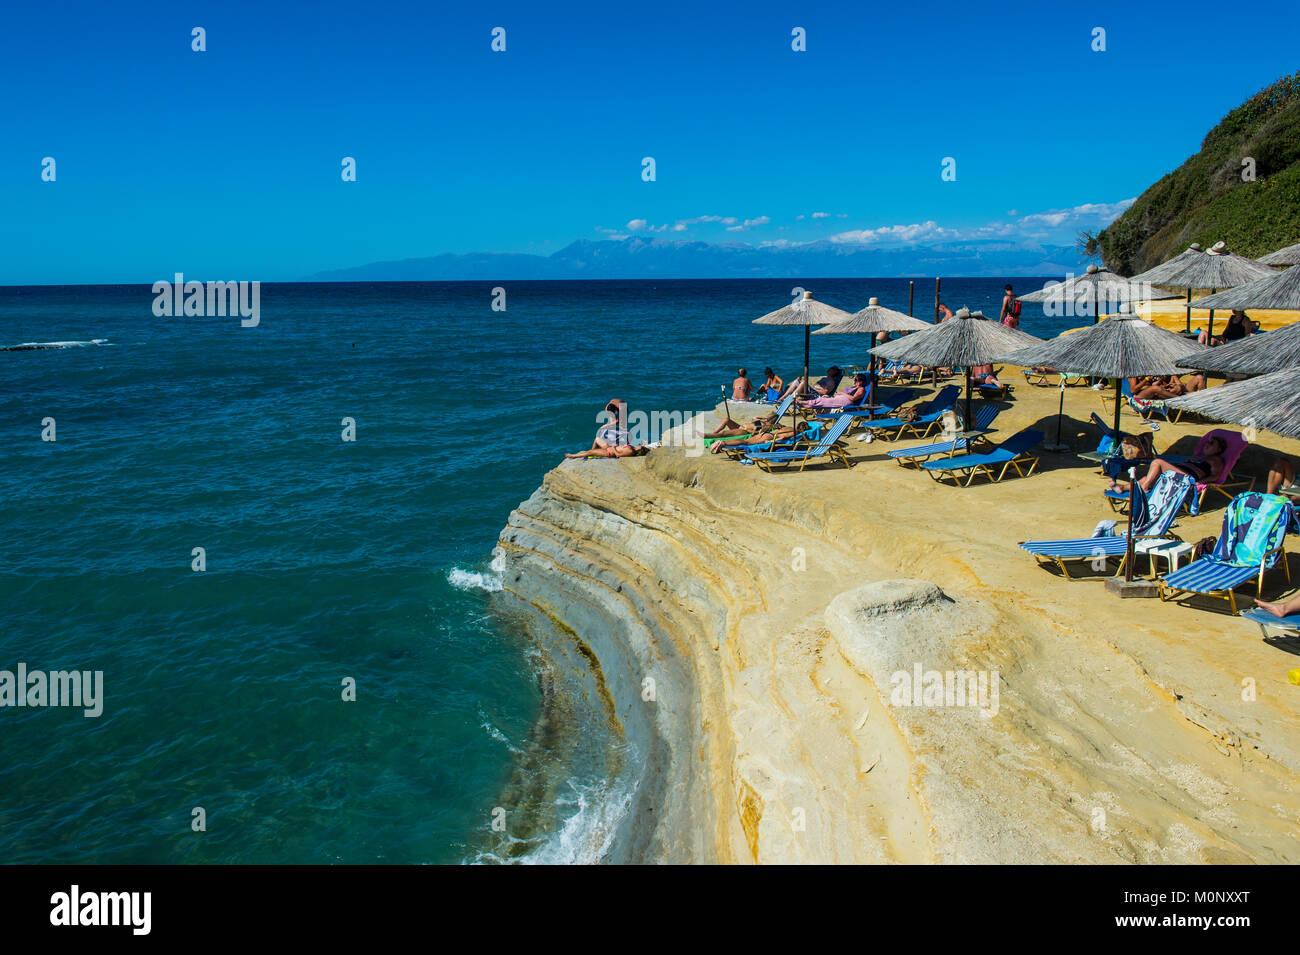 Canal d´amour beach and rock formations,Sidari,Corfu,Ionian Islands,Greece - Stock Image